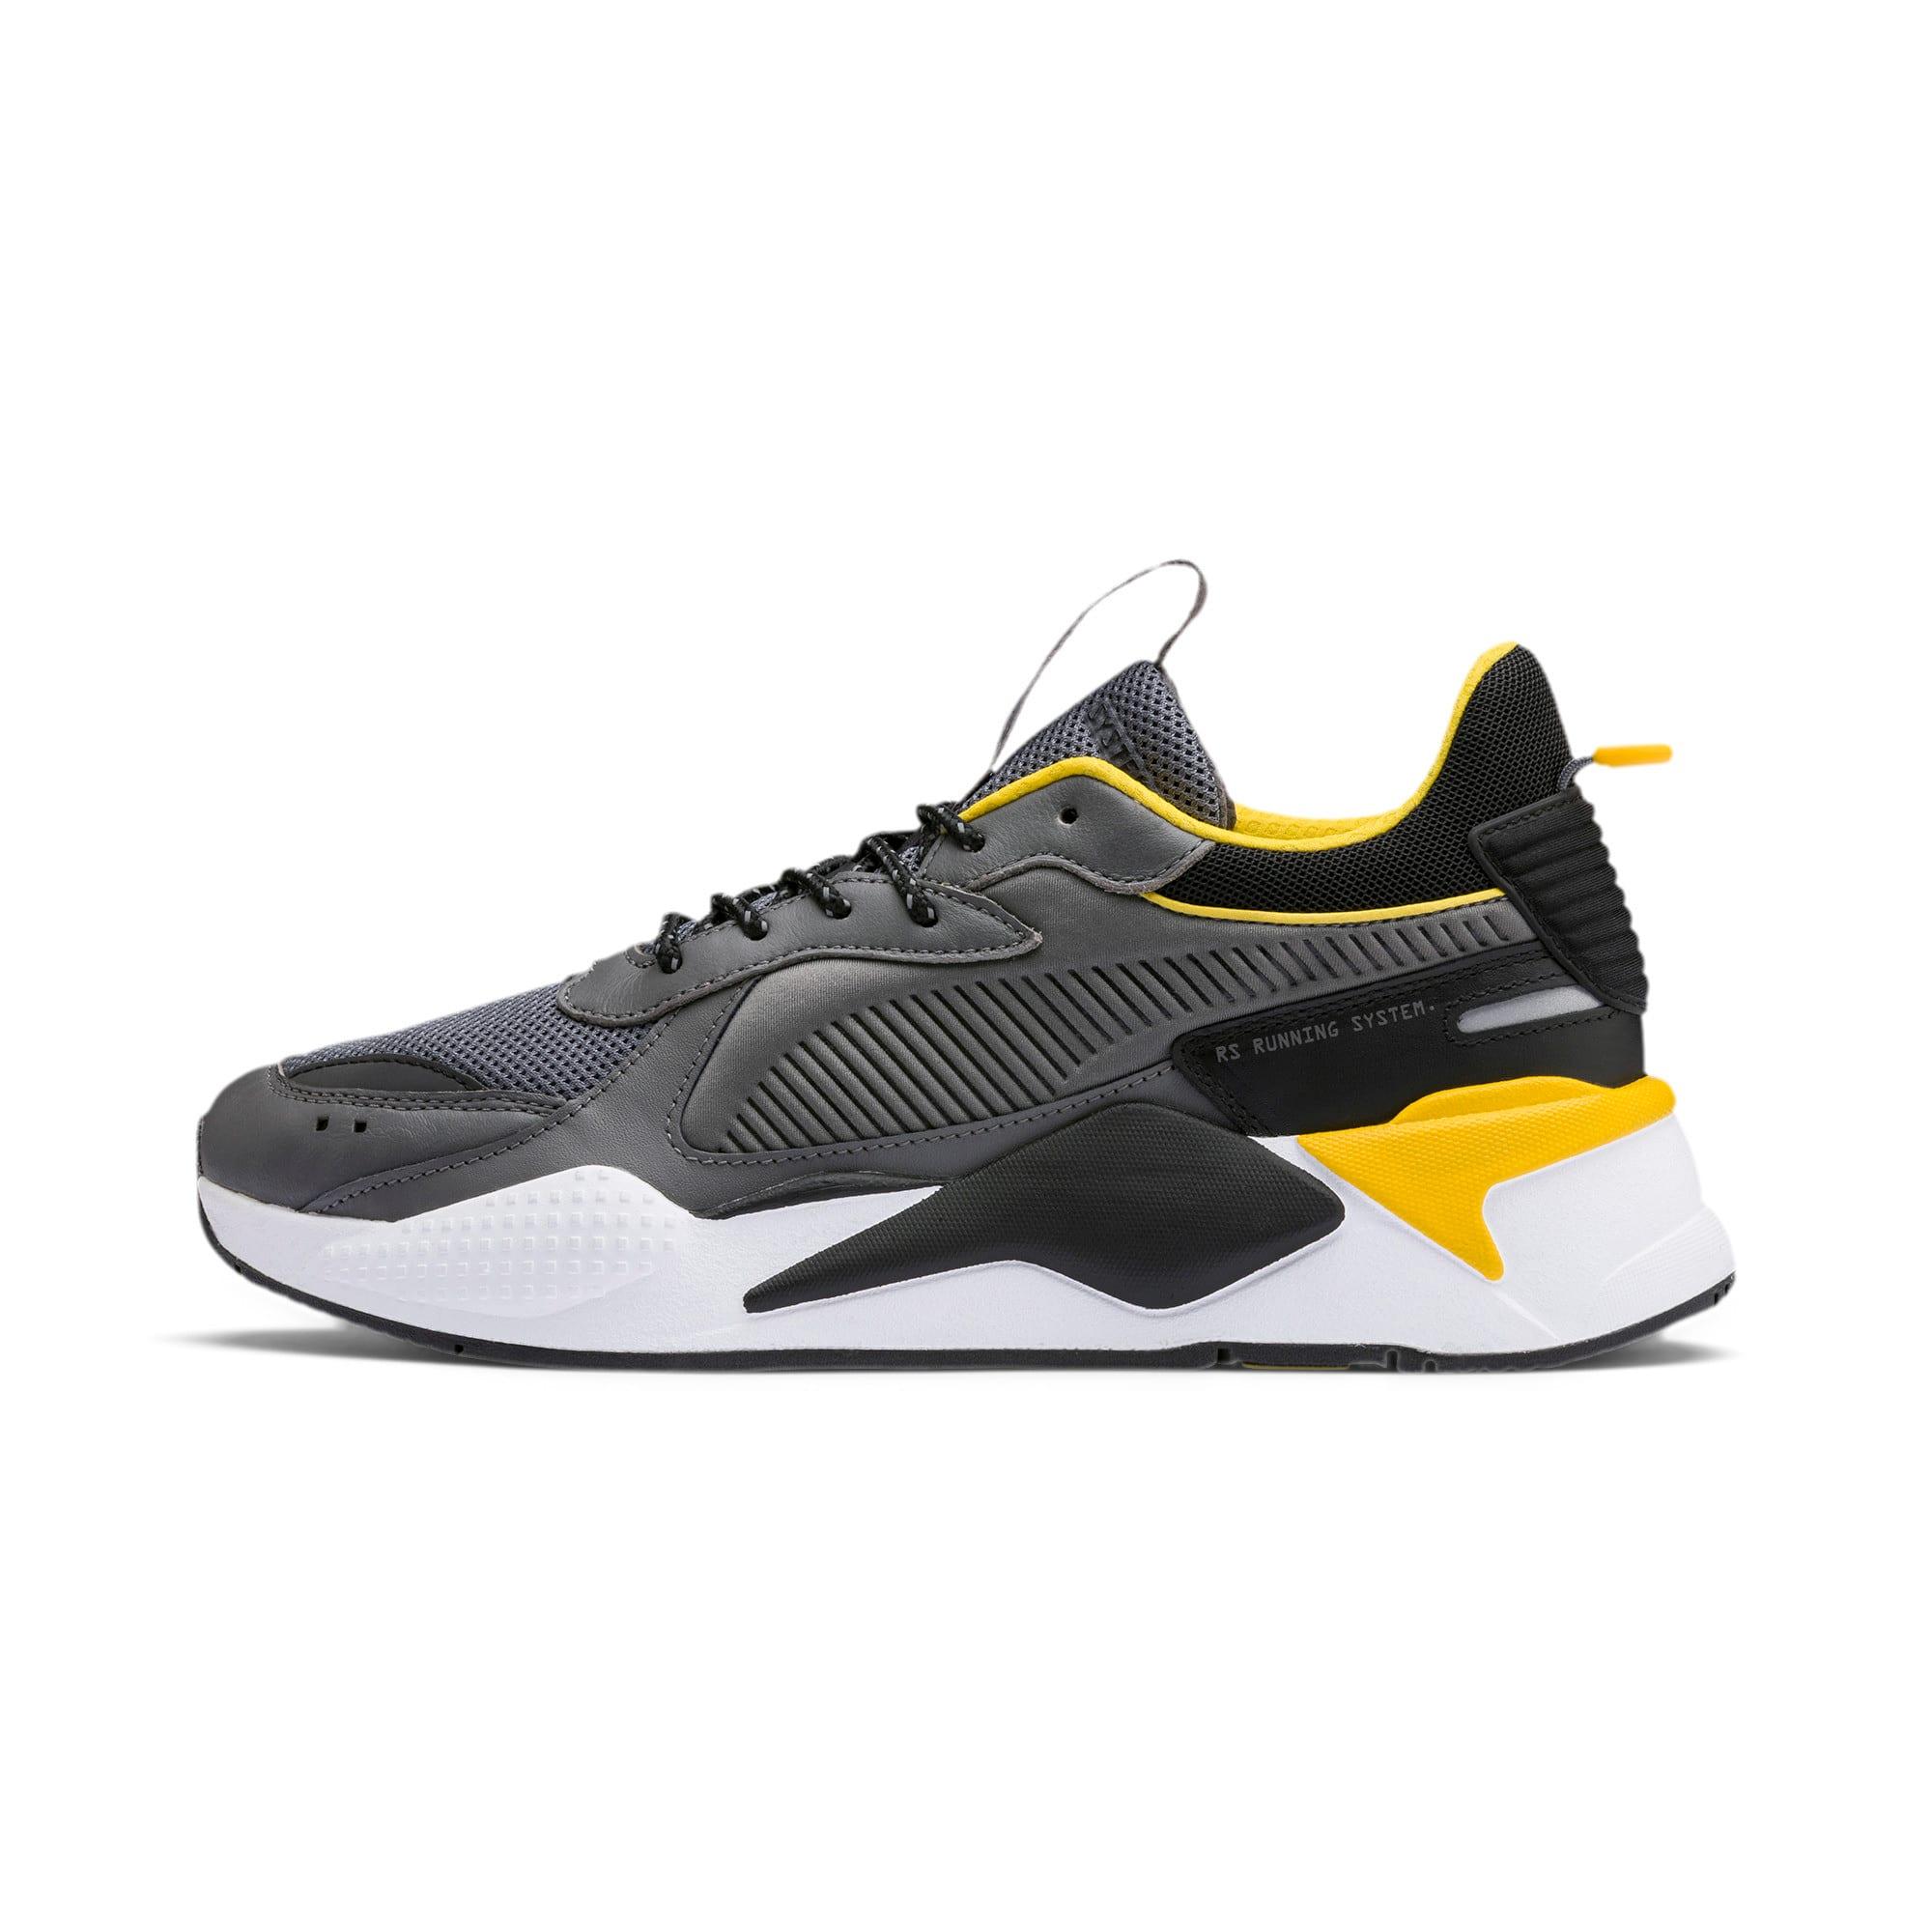 Thumbnail 1 of RS-X Sneaker, CASTLEROCK-Puma Black, medium